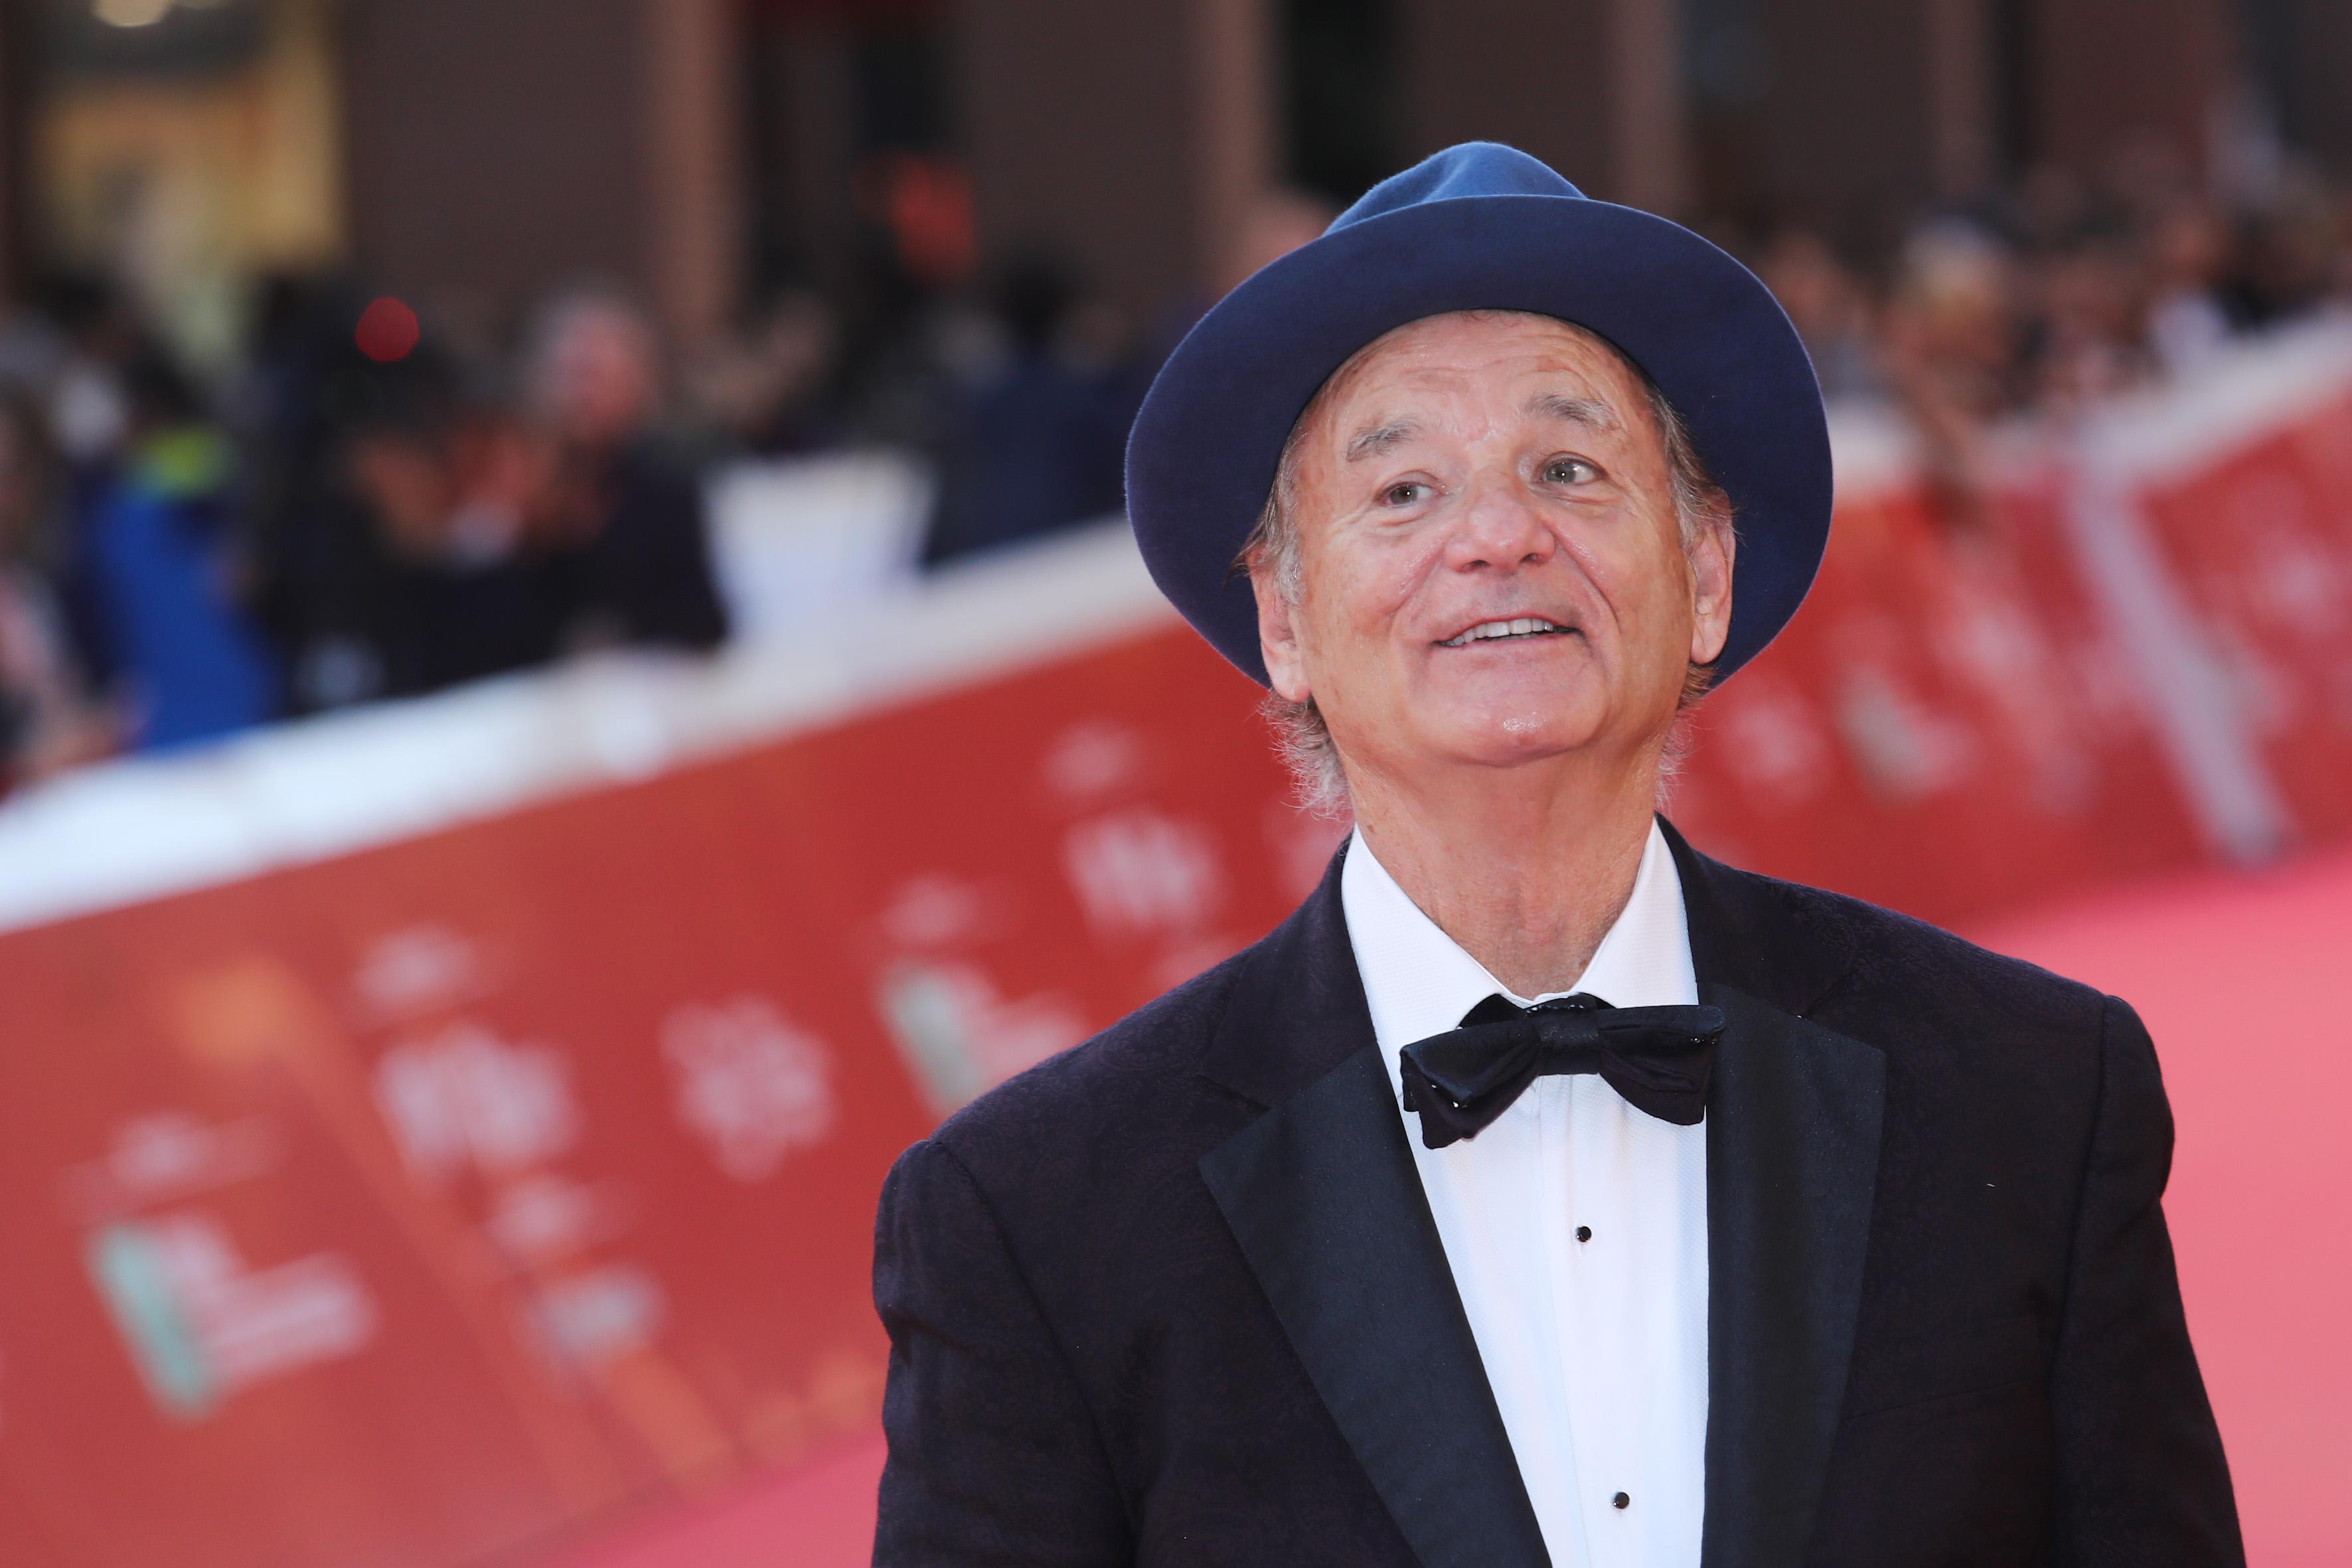 14th Rome Film Festival - Bill Murray Masterclass - Red Carpet